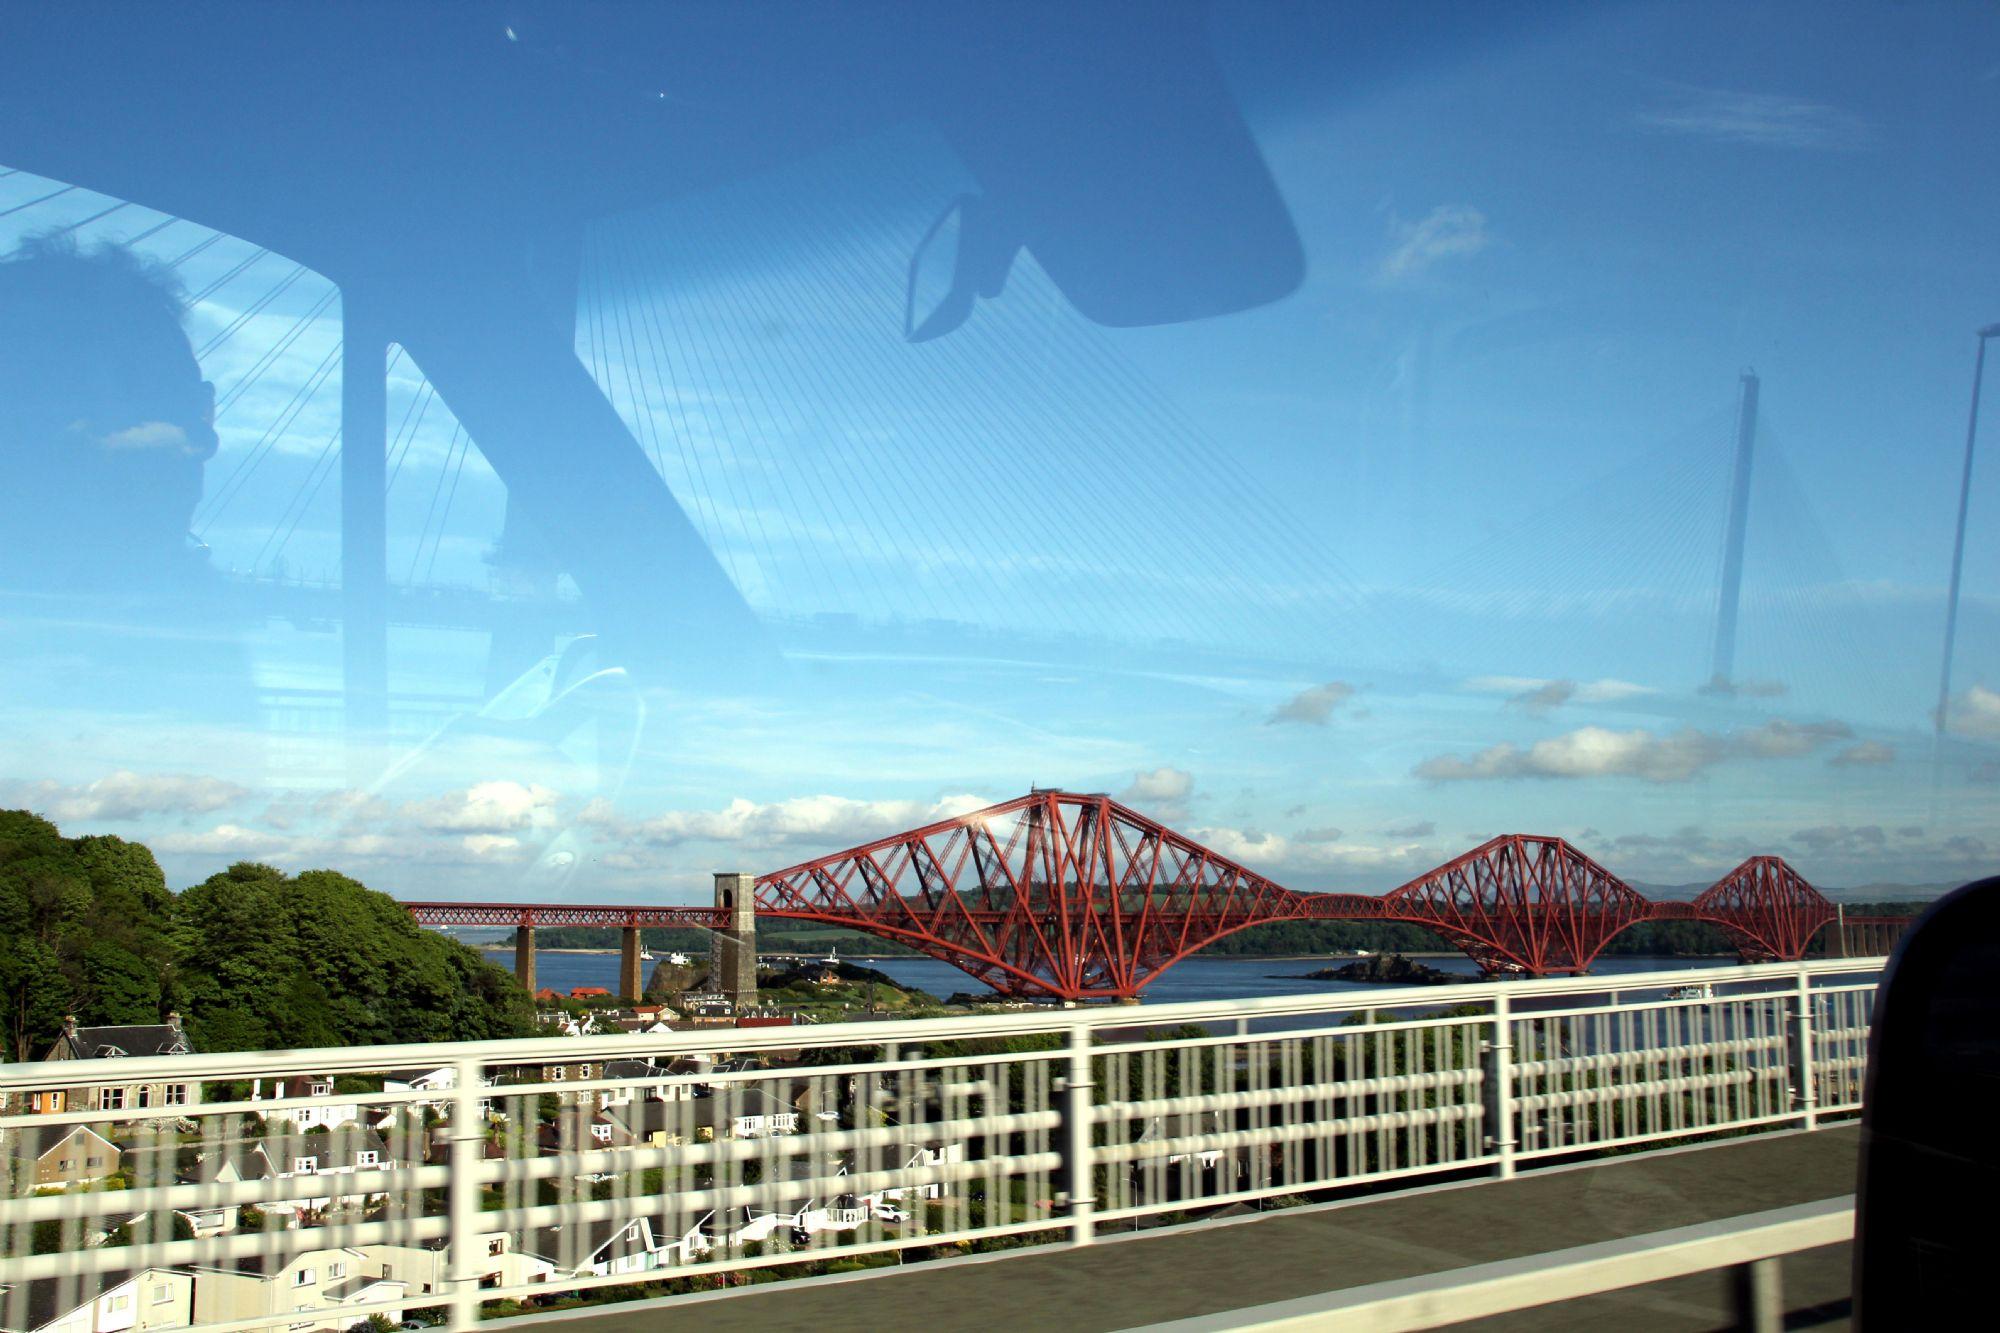 Artistic shot of Forth Bridge